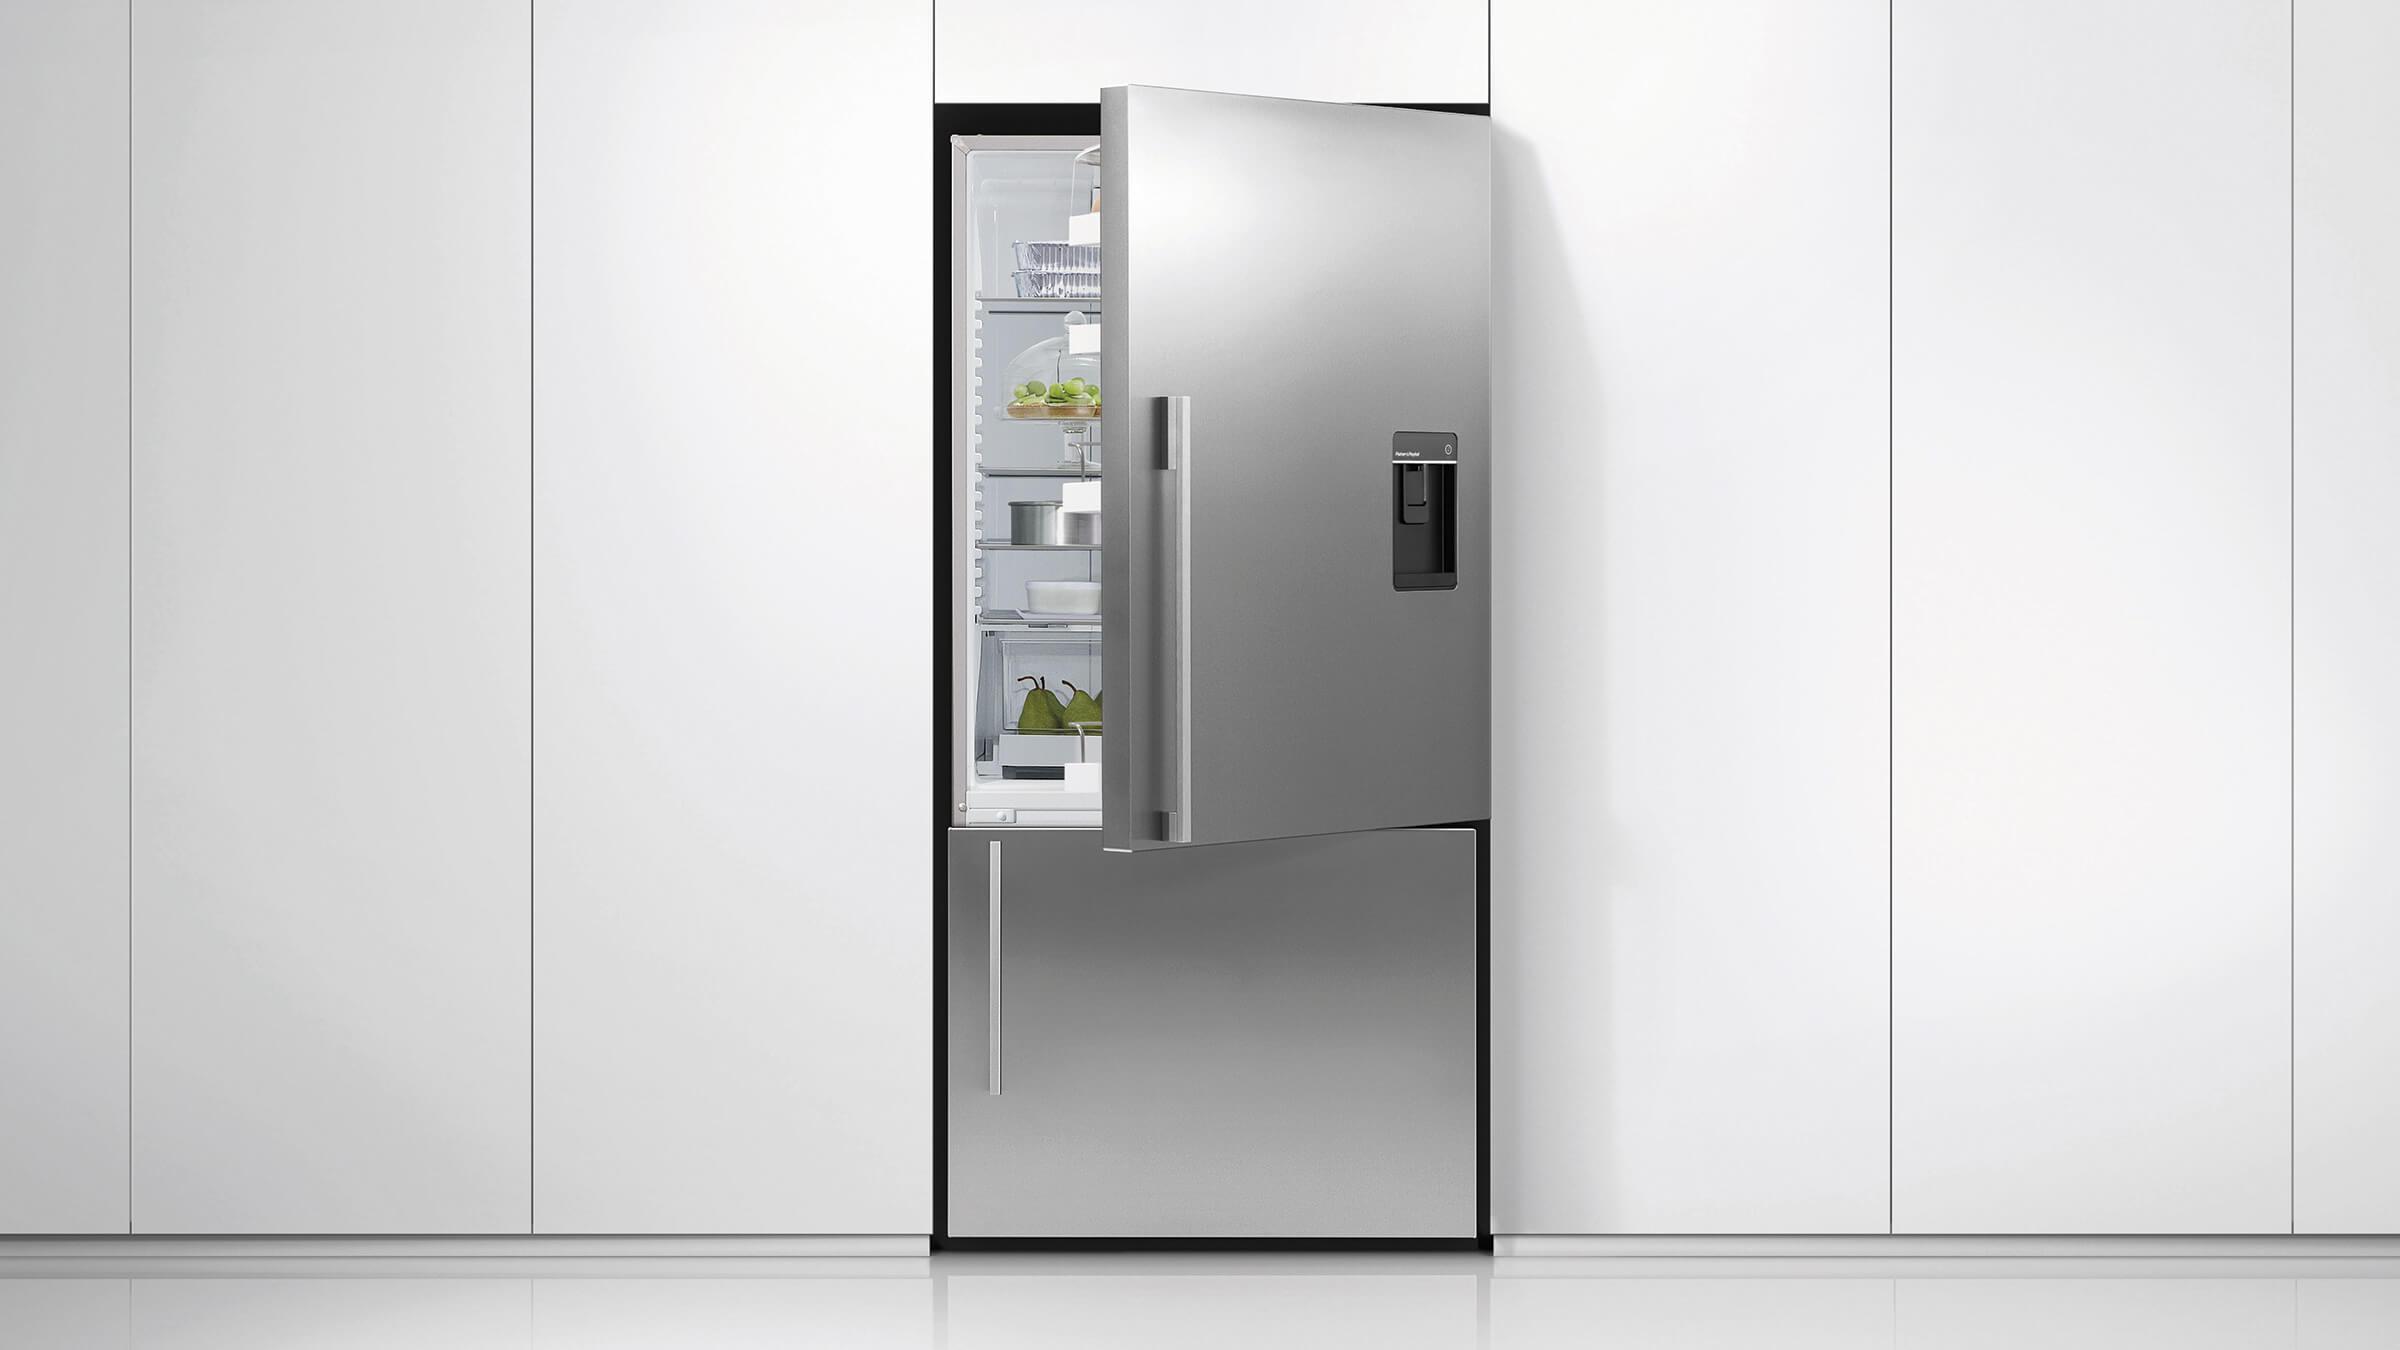 Fisher Paykel Activesmart Fridge Freezer E442brxfdu5 Stainless